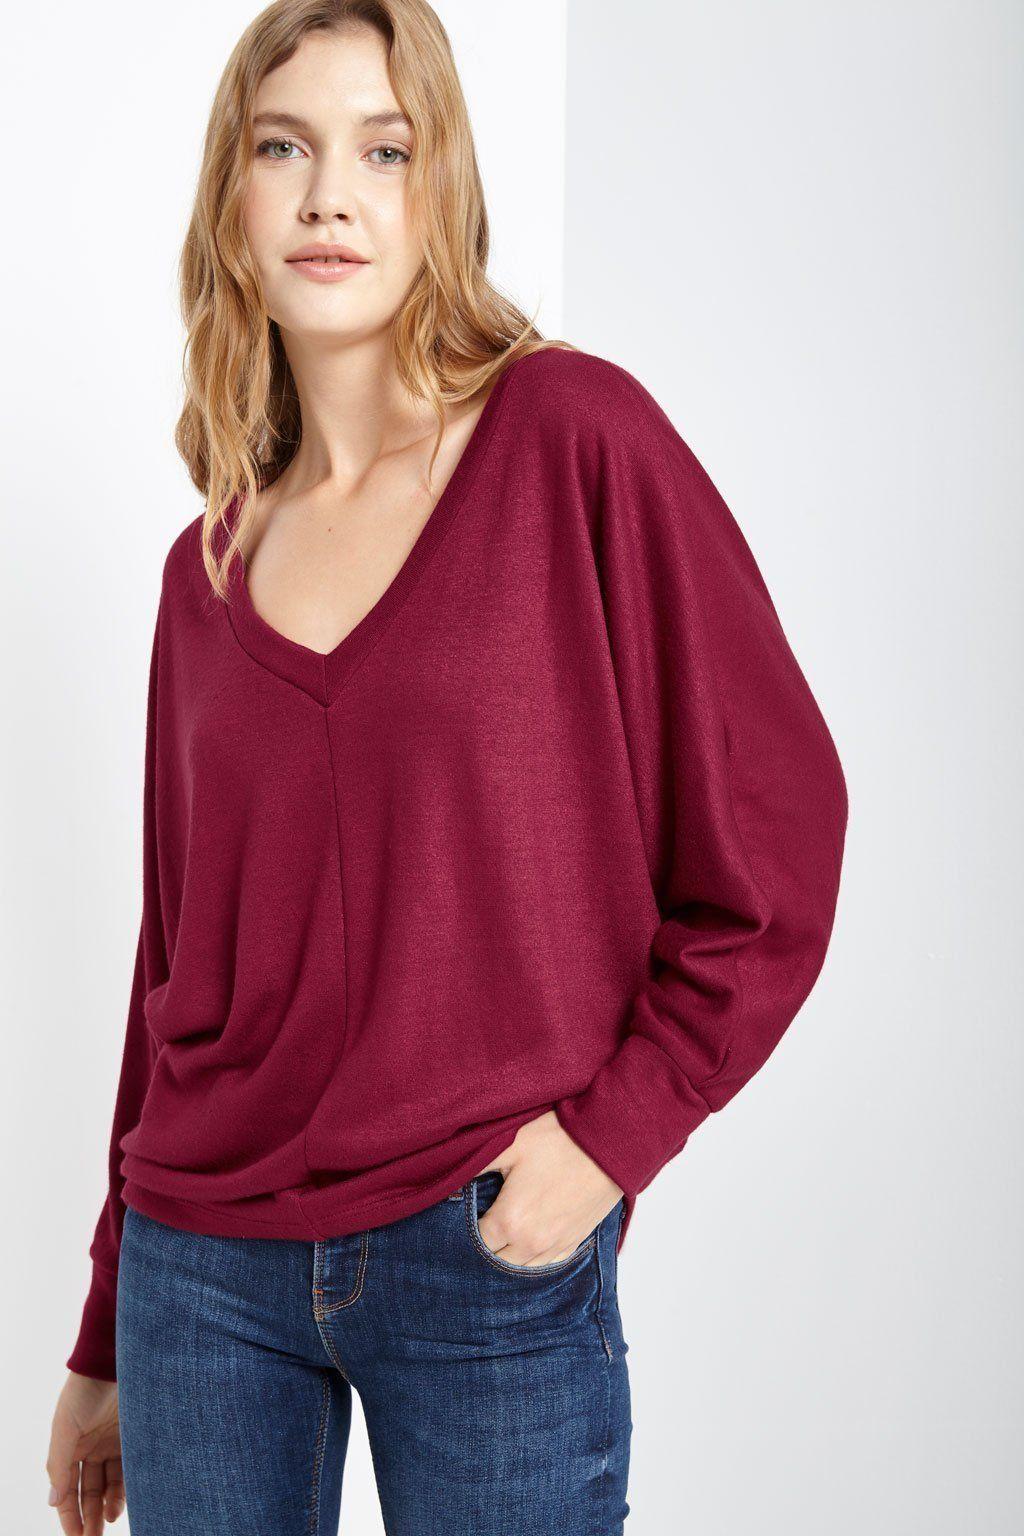 62995273fd1 Marge Dolman Sleeve Sweater Top - T28956INN-NT00044-BUR-L